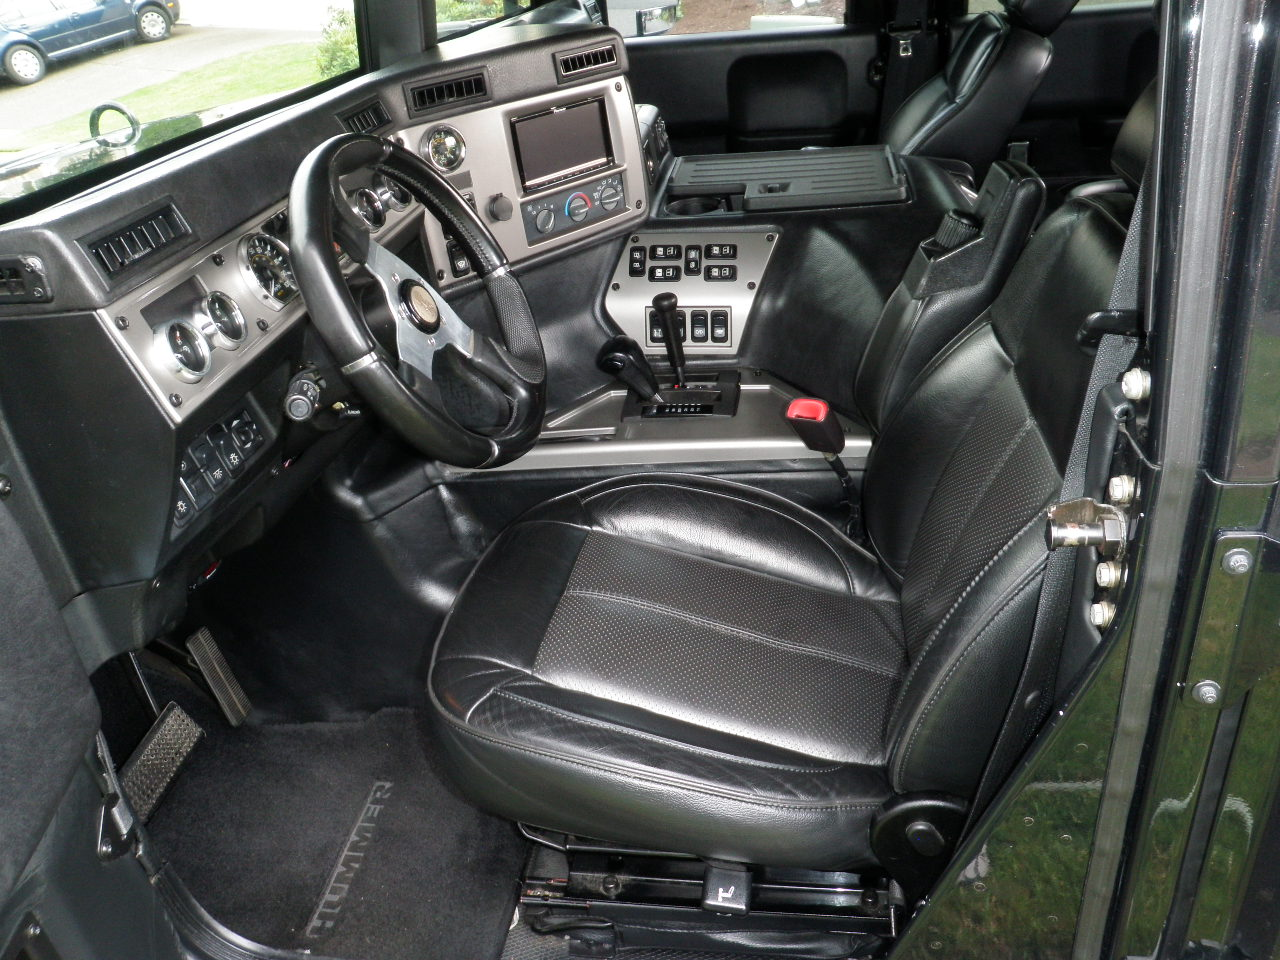 Worksheet. 2006 hummer h1 alpha custom sema show trucksold